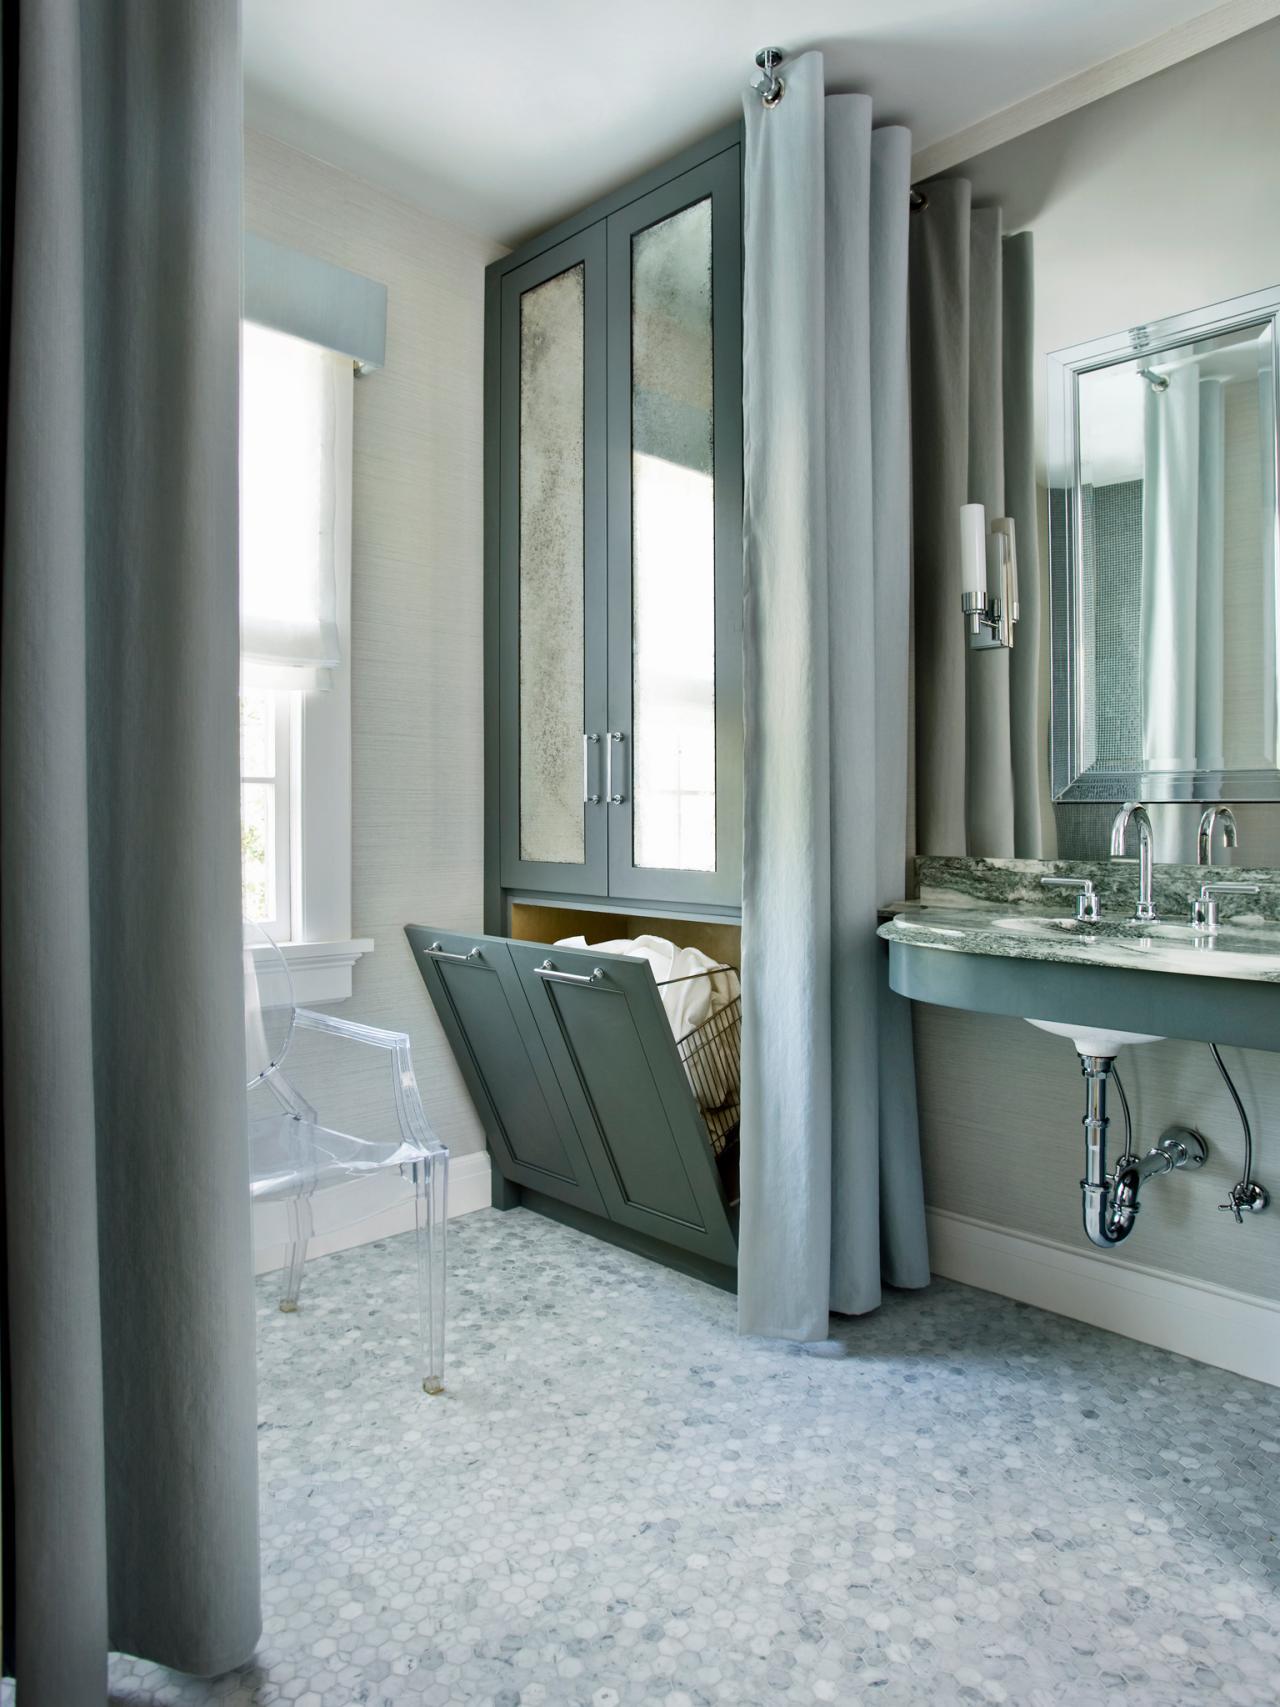 15 Smart Bath Storage Ideas Bathroom Ideas Amp Designs Hgtv